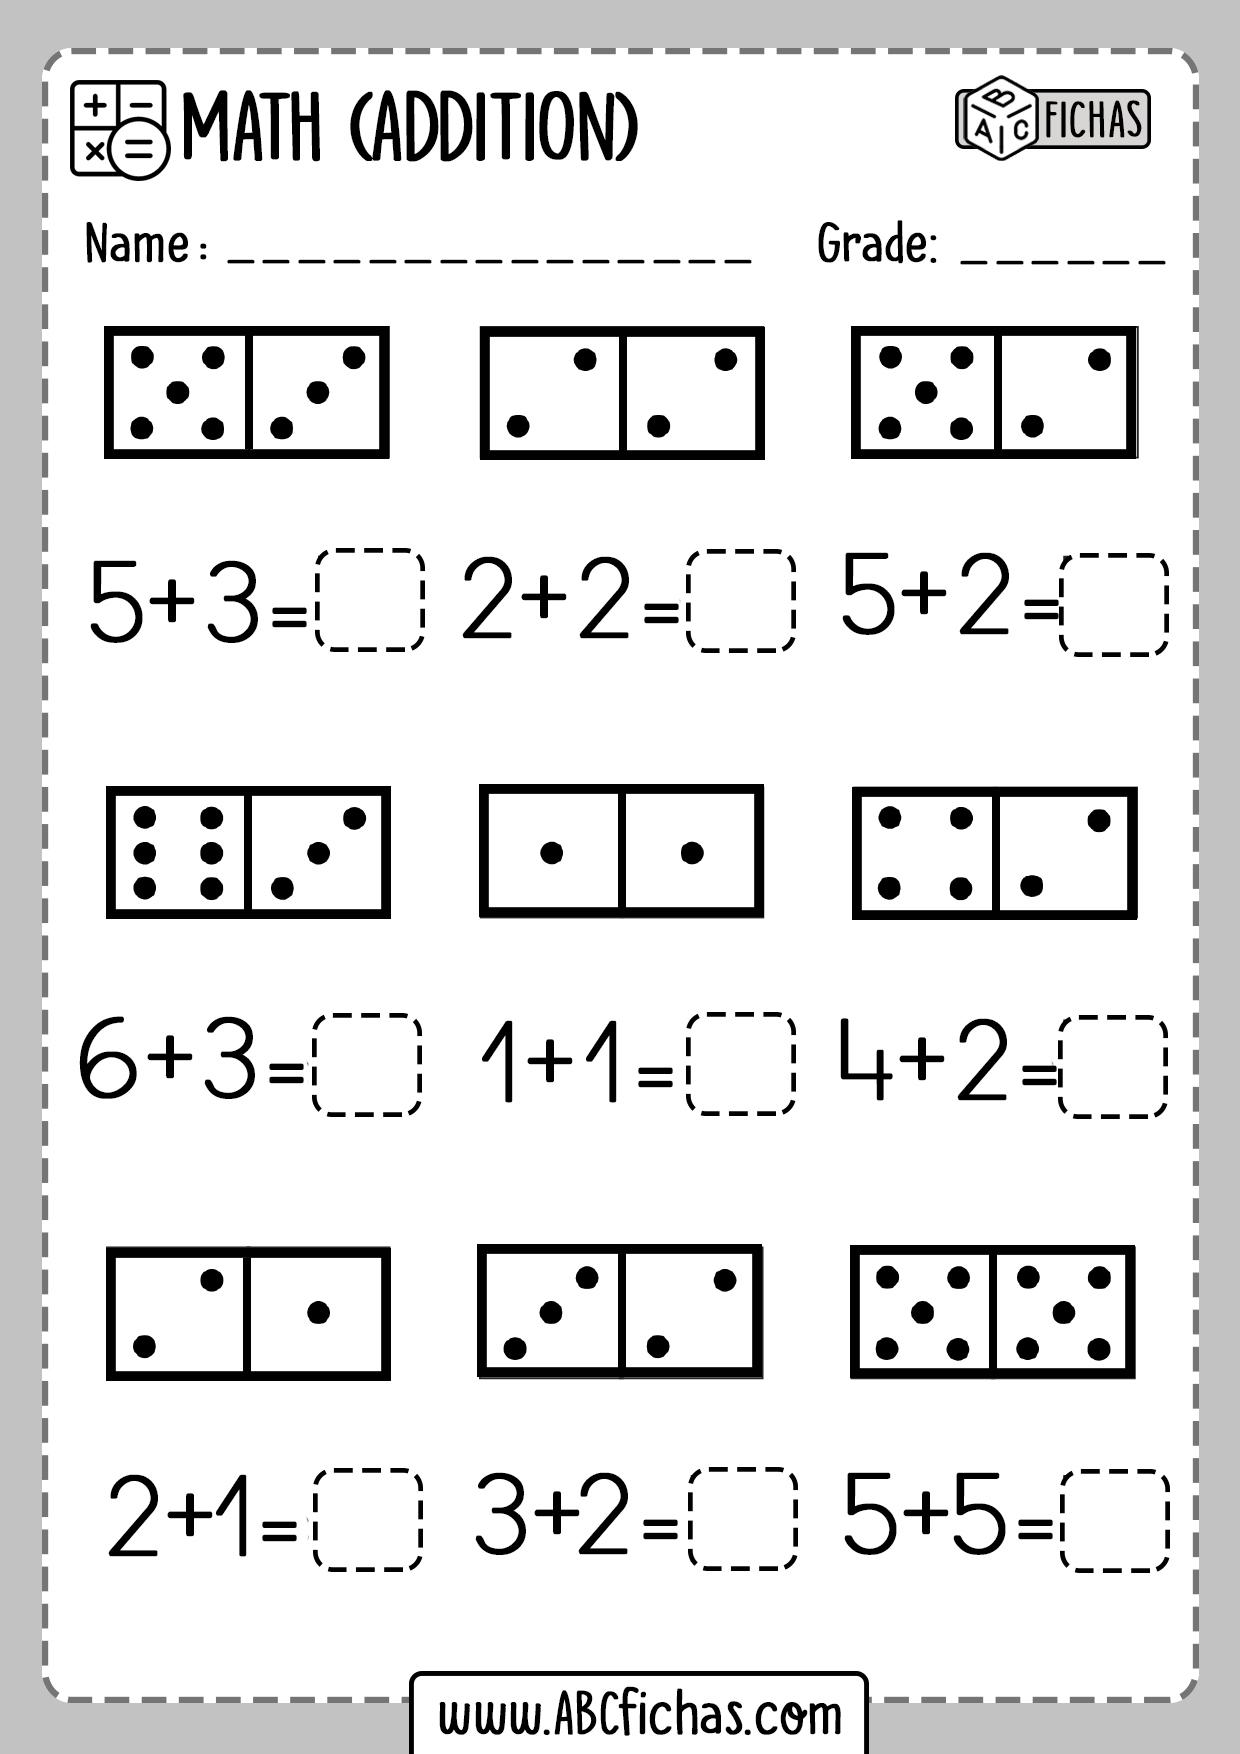 Domino addition worksheet